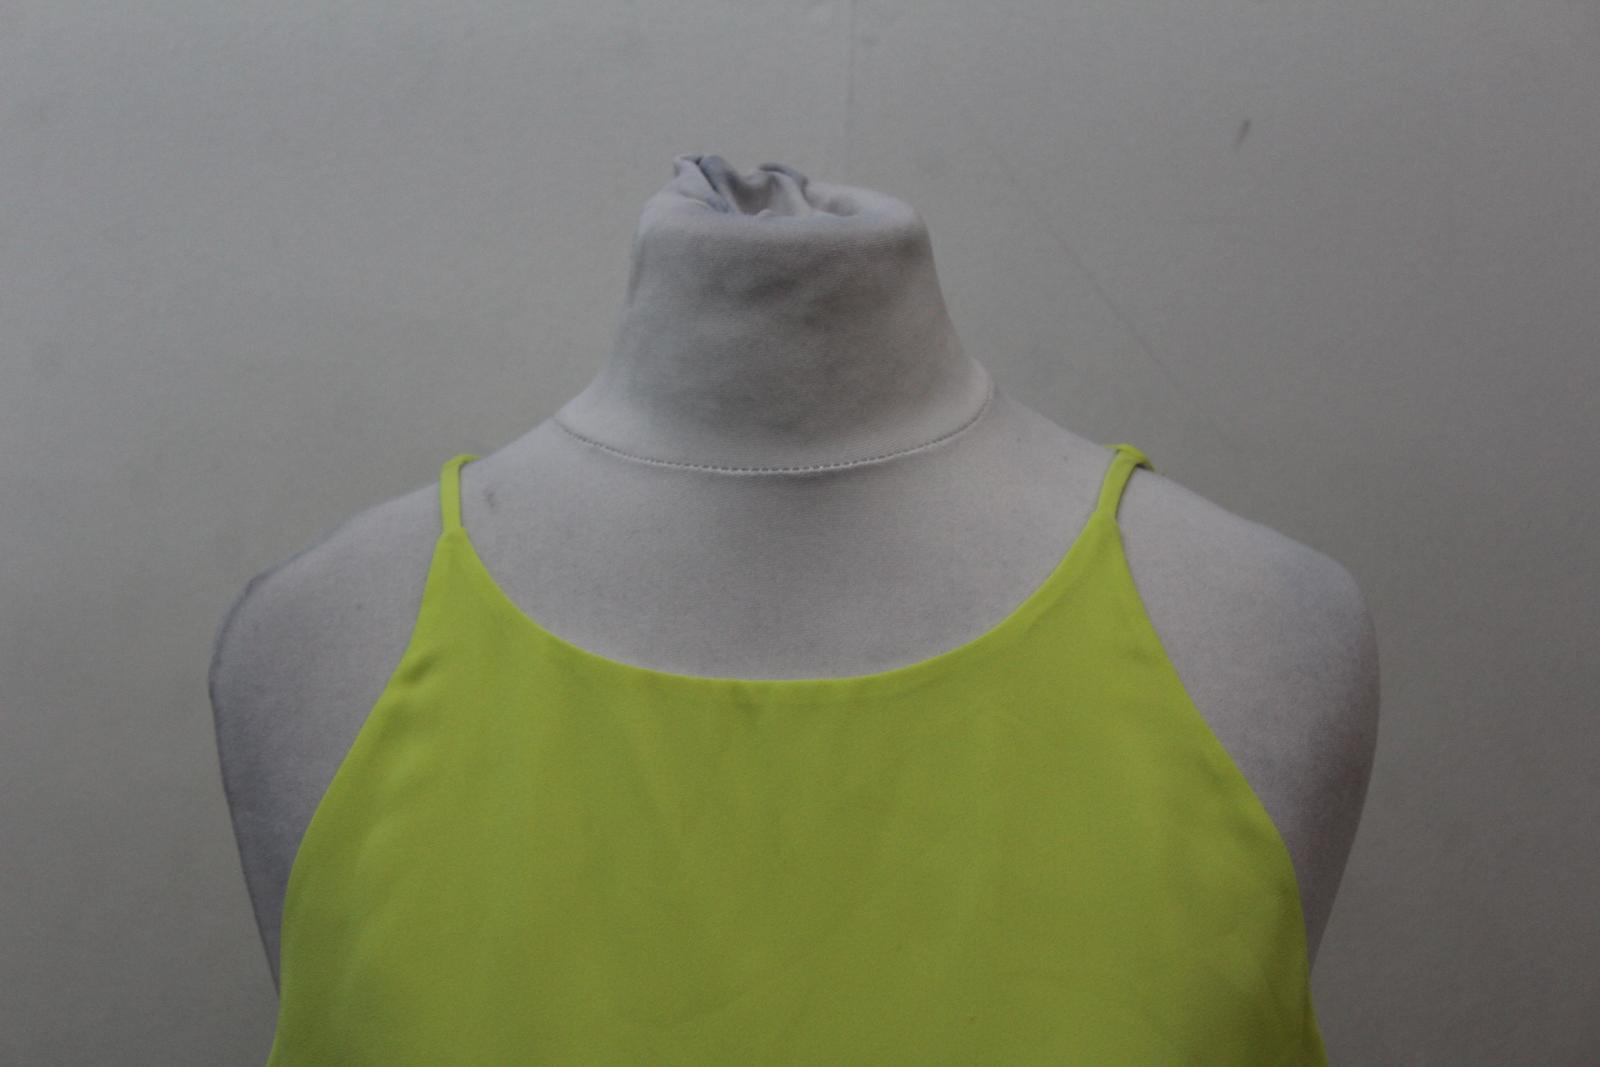 Neck White Elizabeth Yellow amp; James Crop And Scoope Layered Ladies Xxs Top Size w11q0SXB